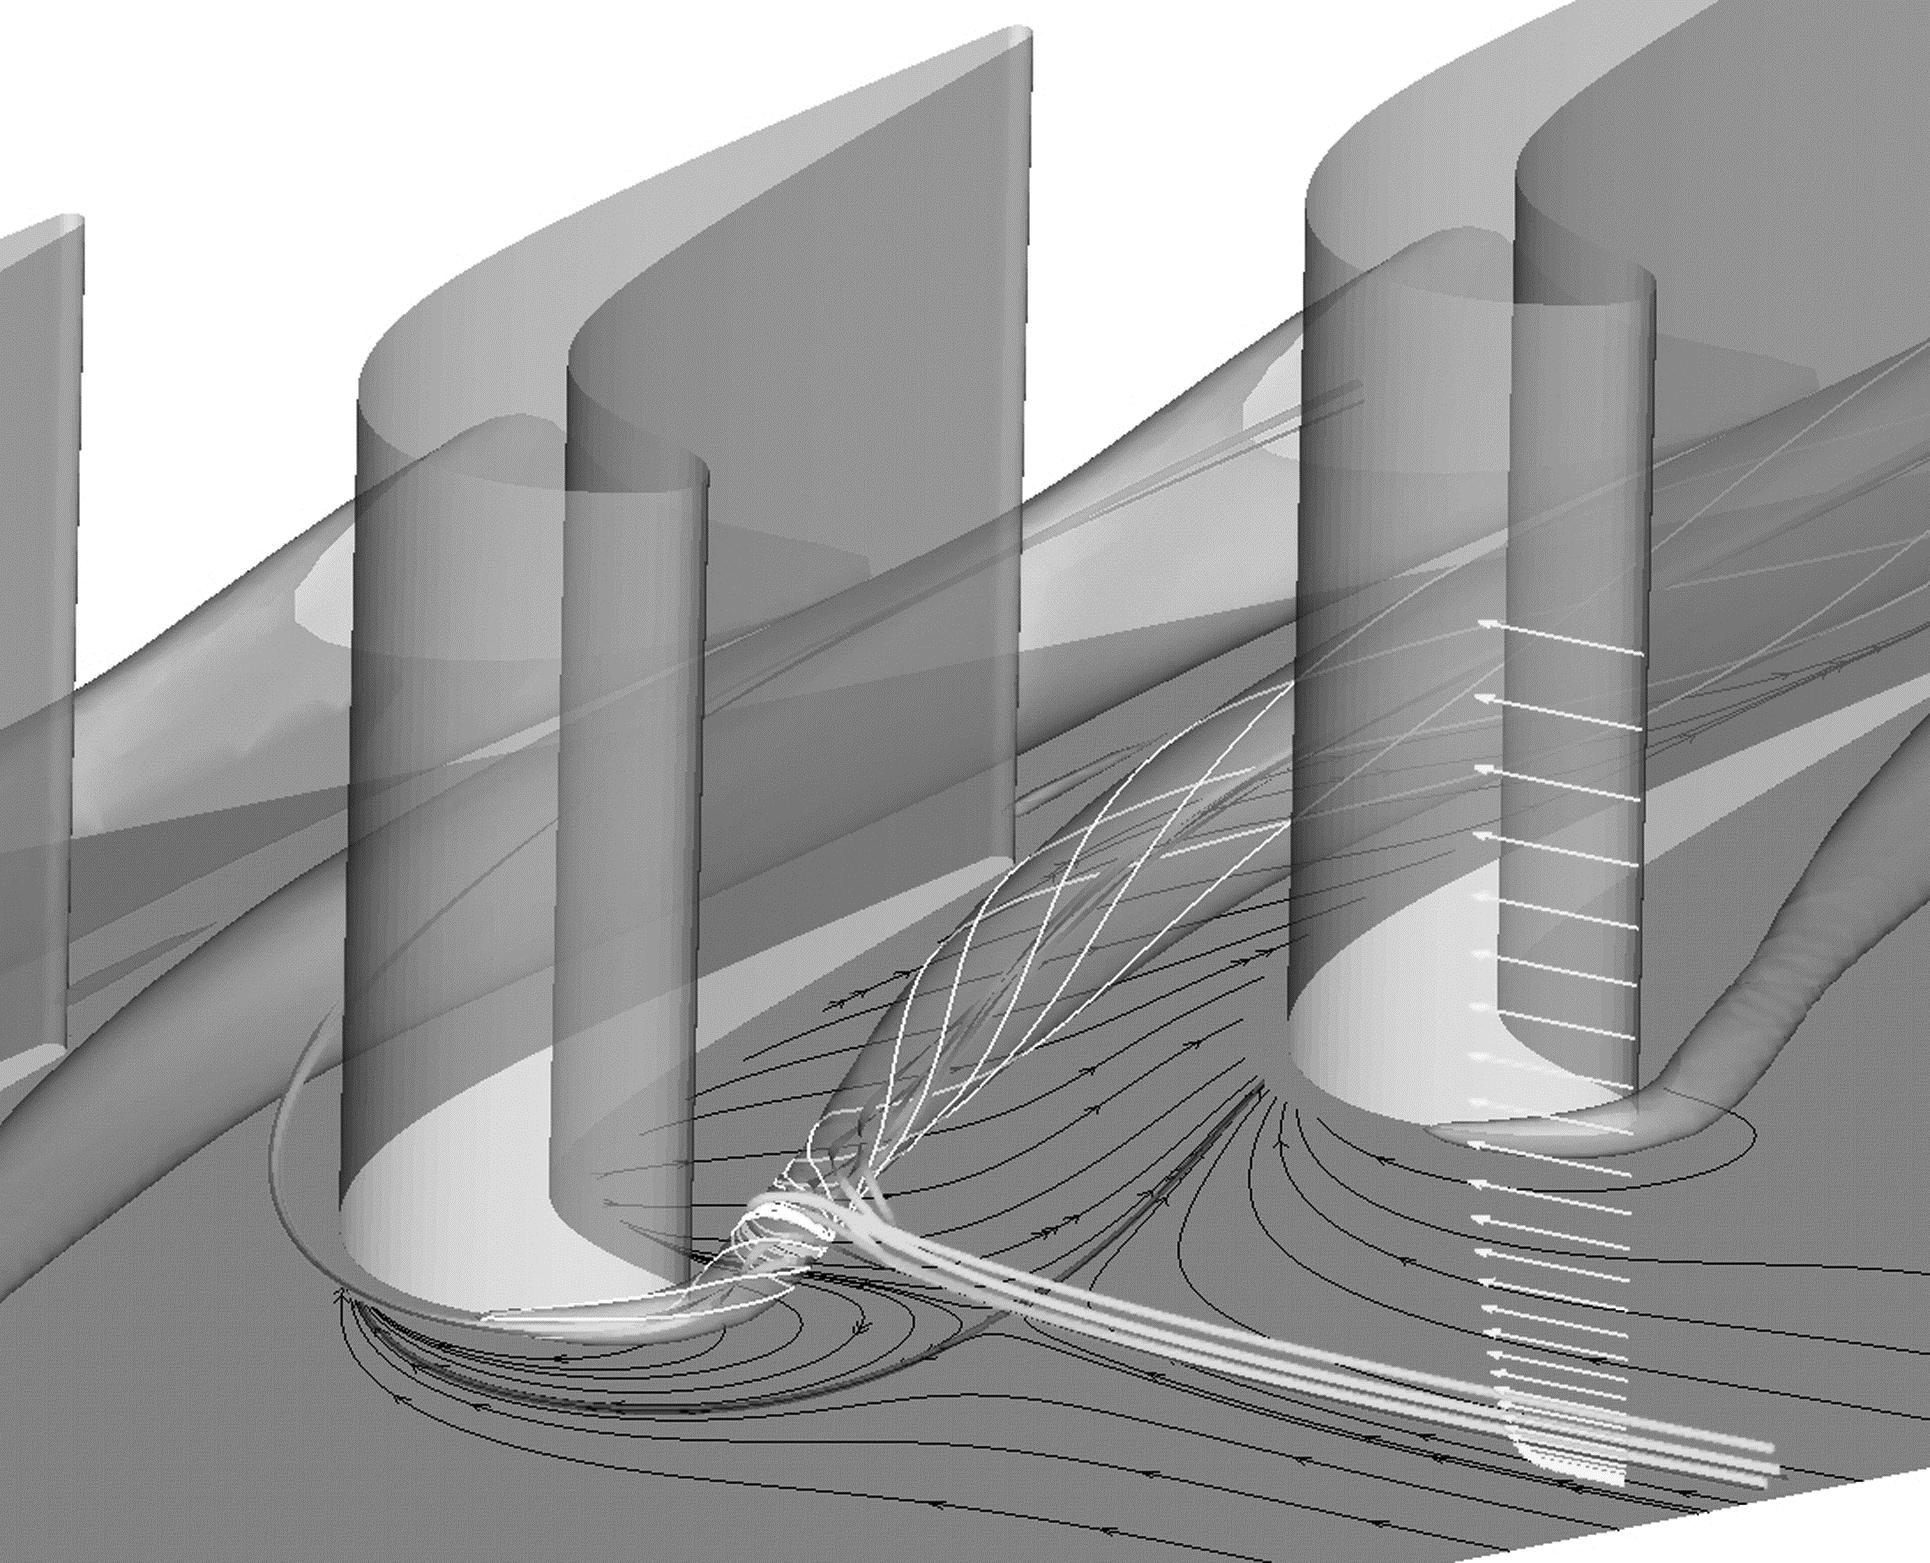 Https google search q turbine blades steam